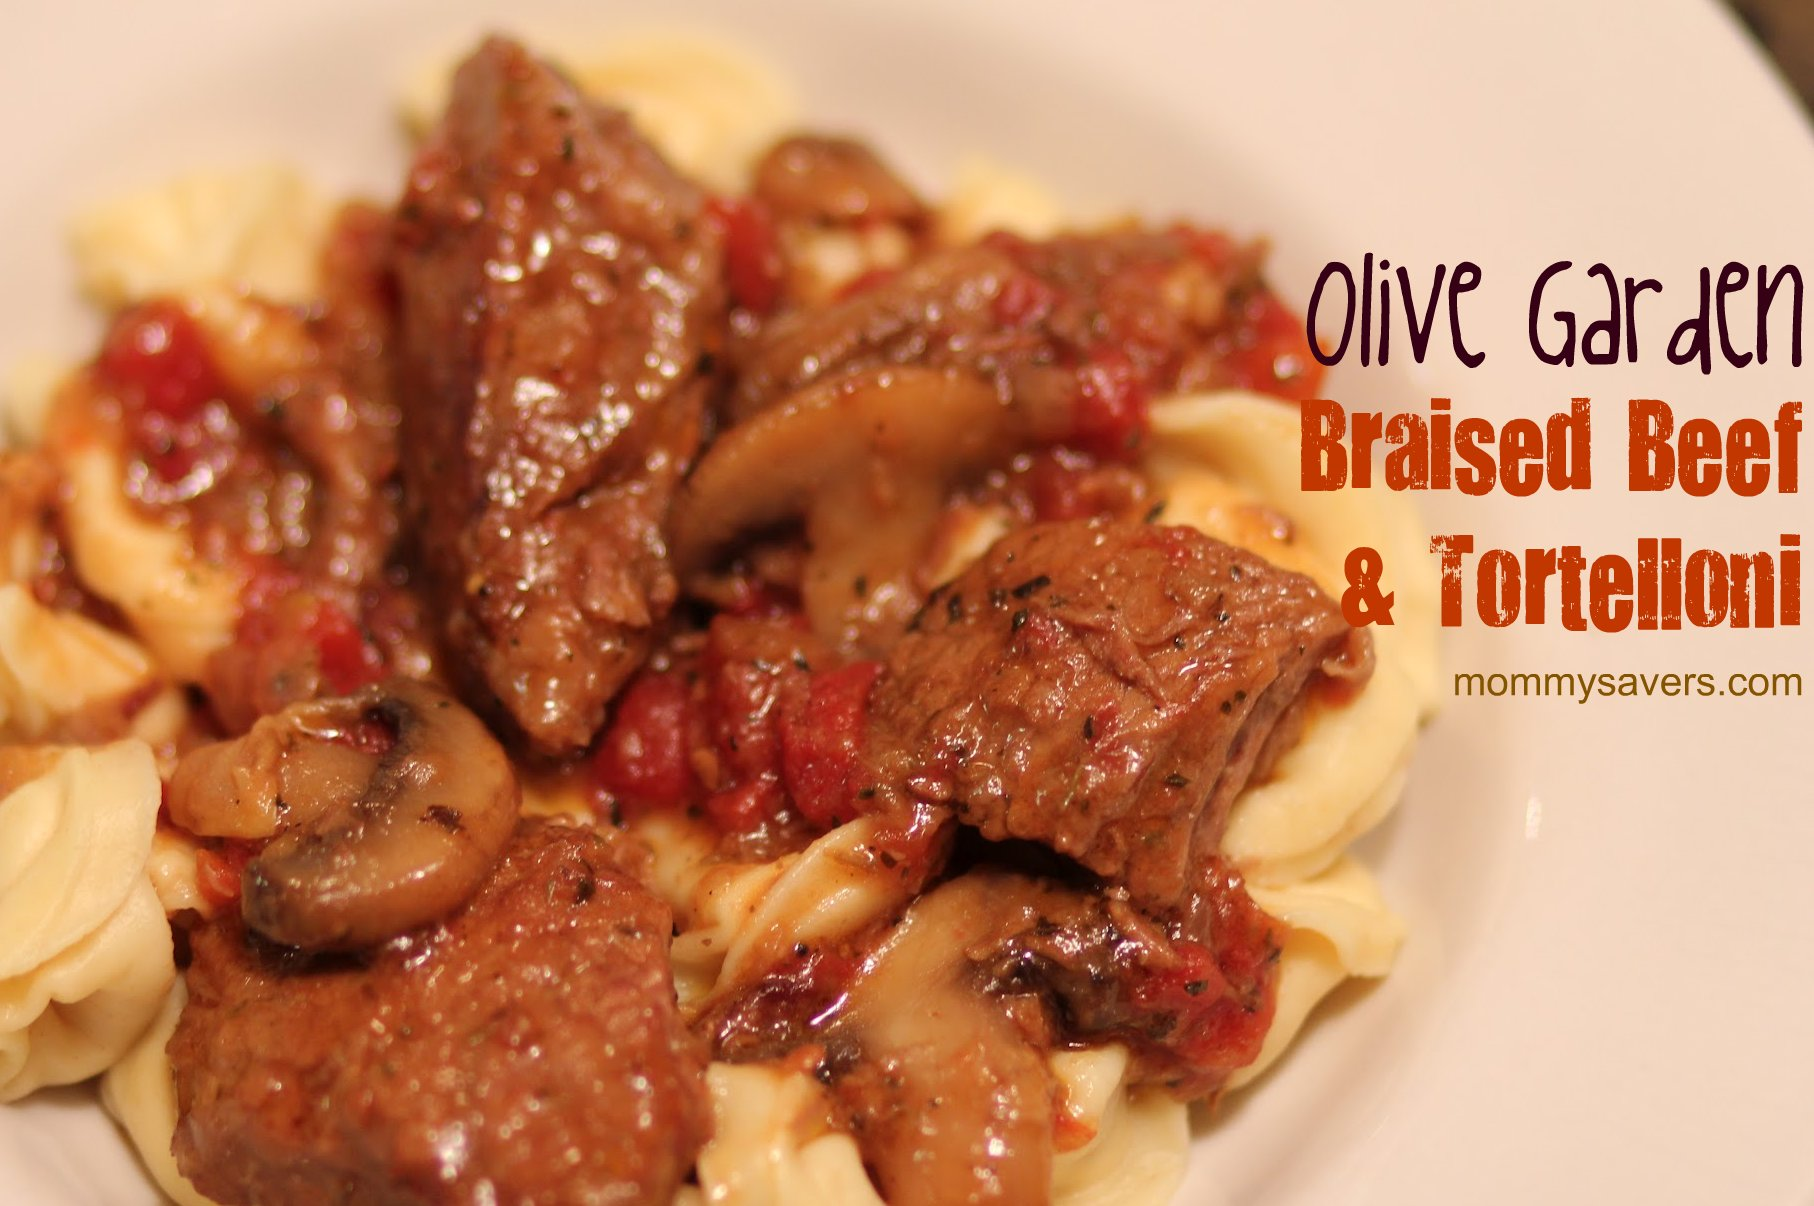 Copycat Recipe:  Olive Garden Braised Beef & Tortelloni